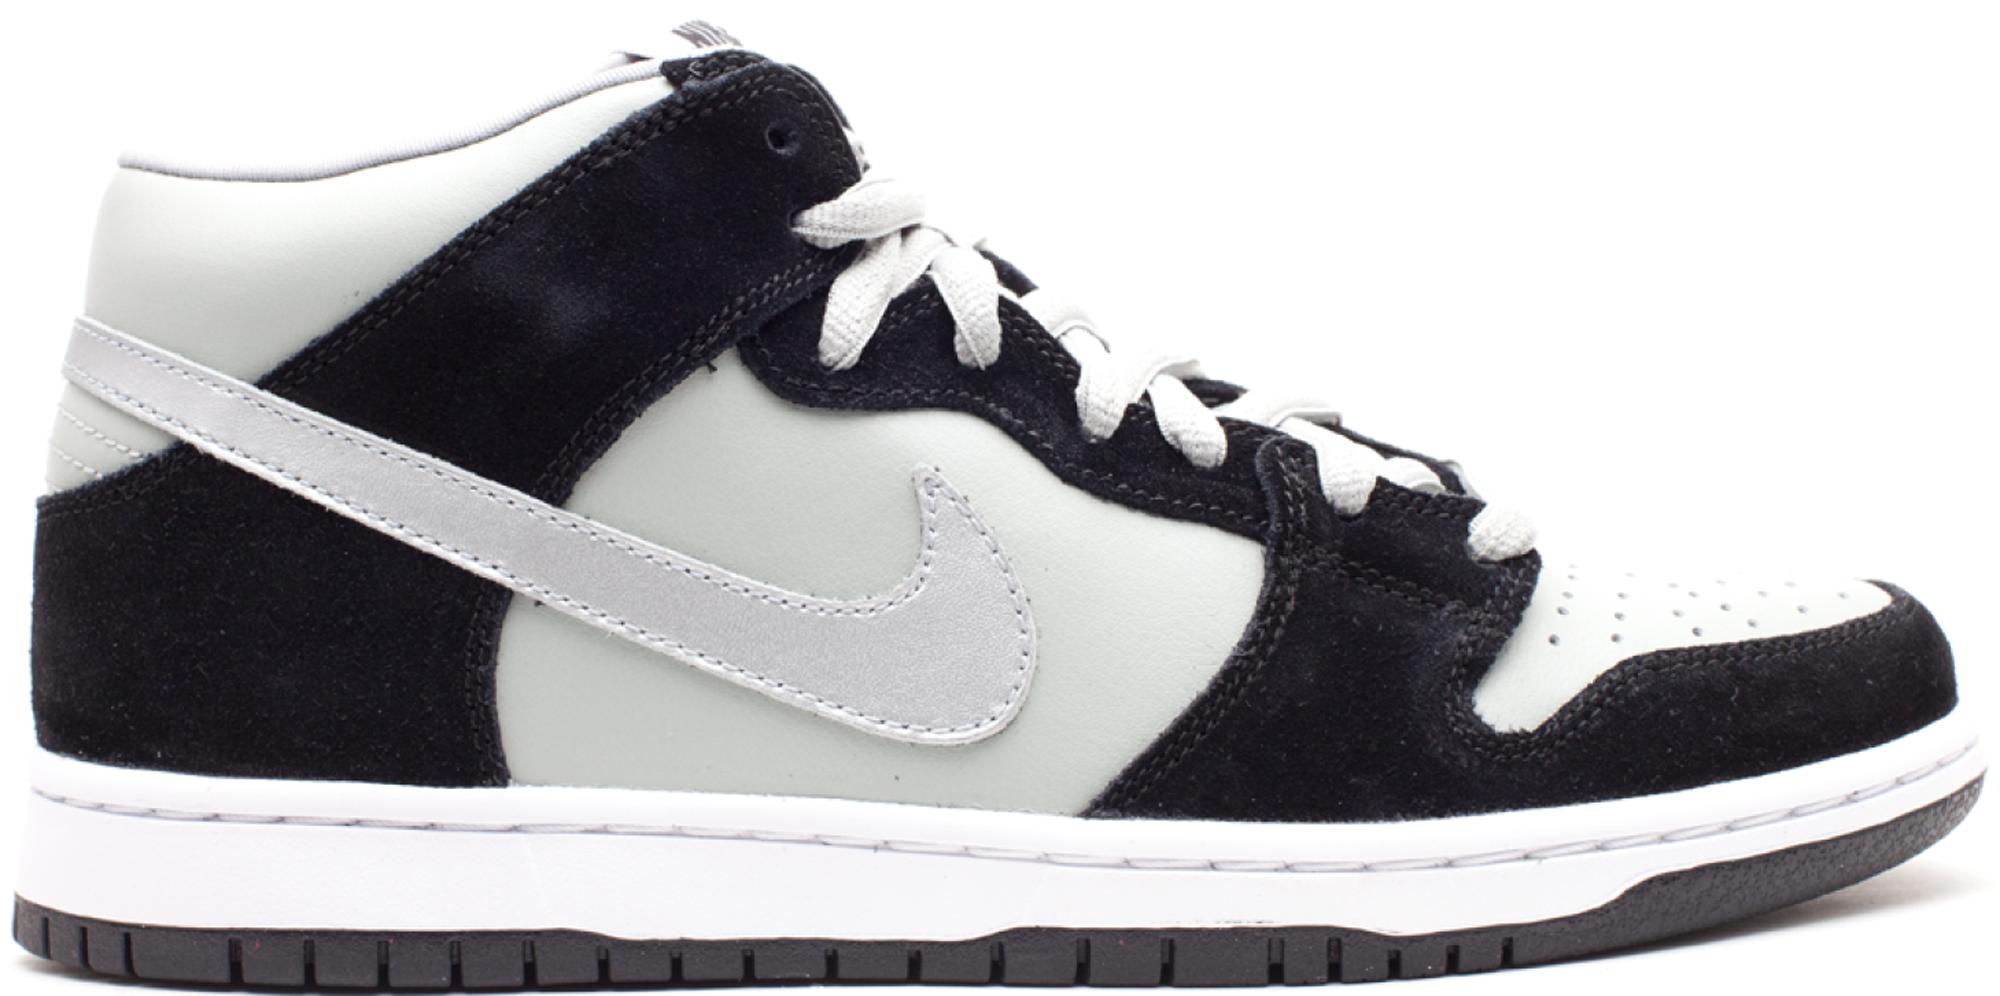 Nike SB Dunk Mid Black Silver - 314383-009